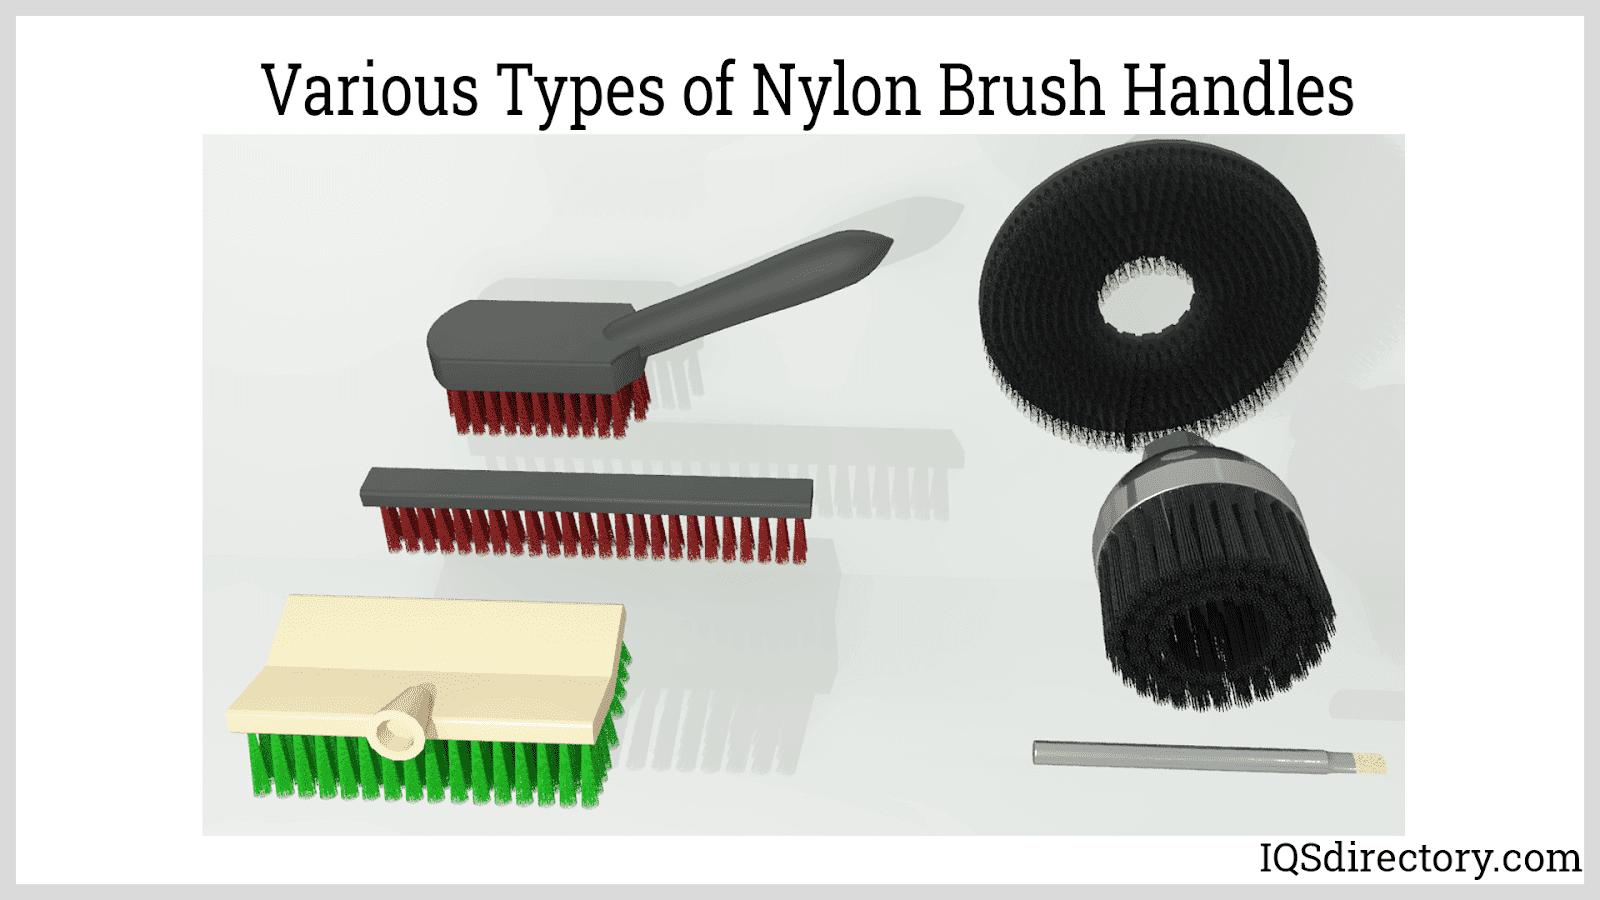 Various Types of Nylon Brush Handles